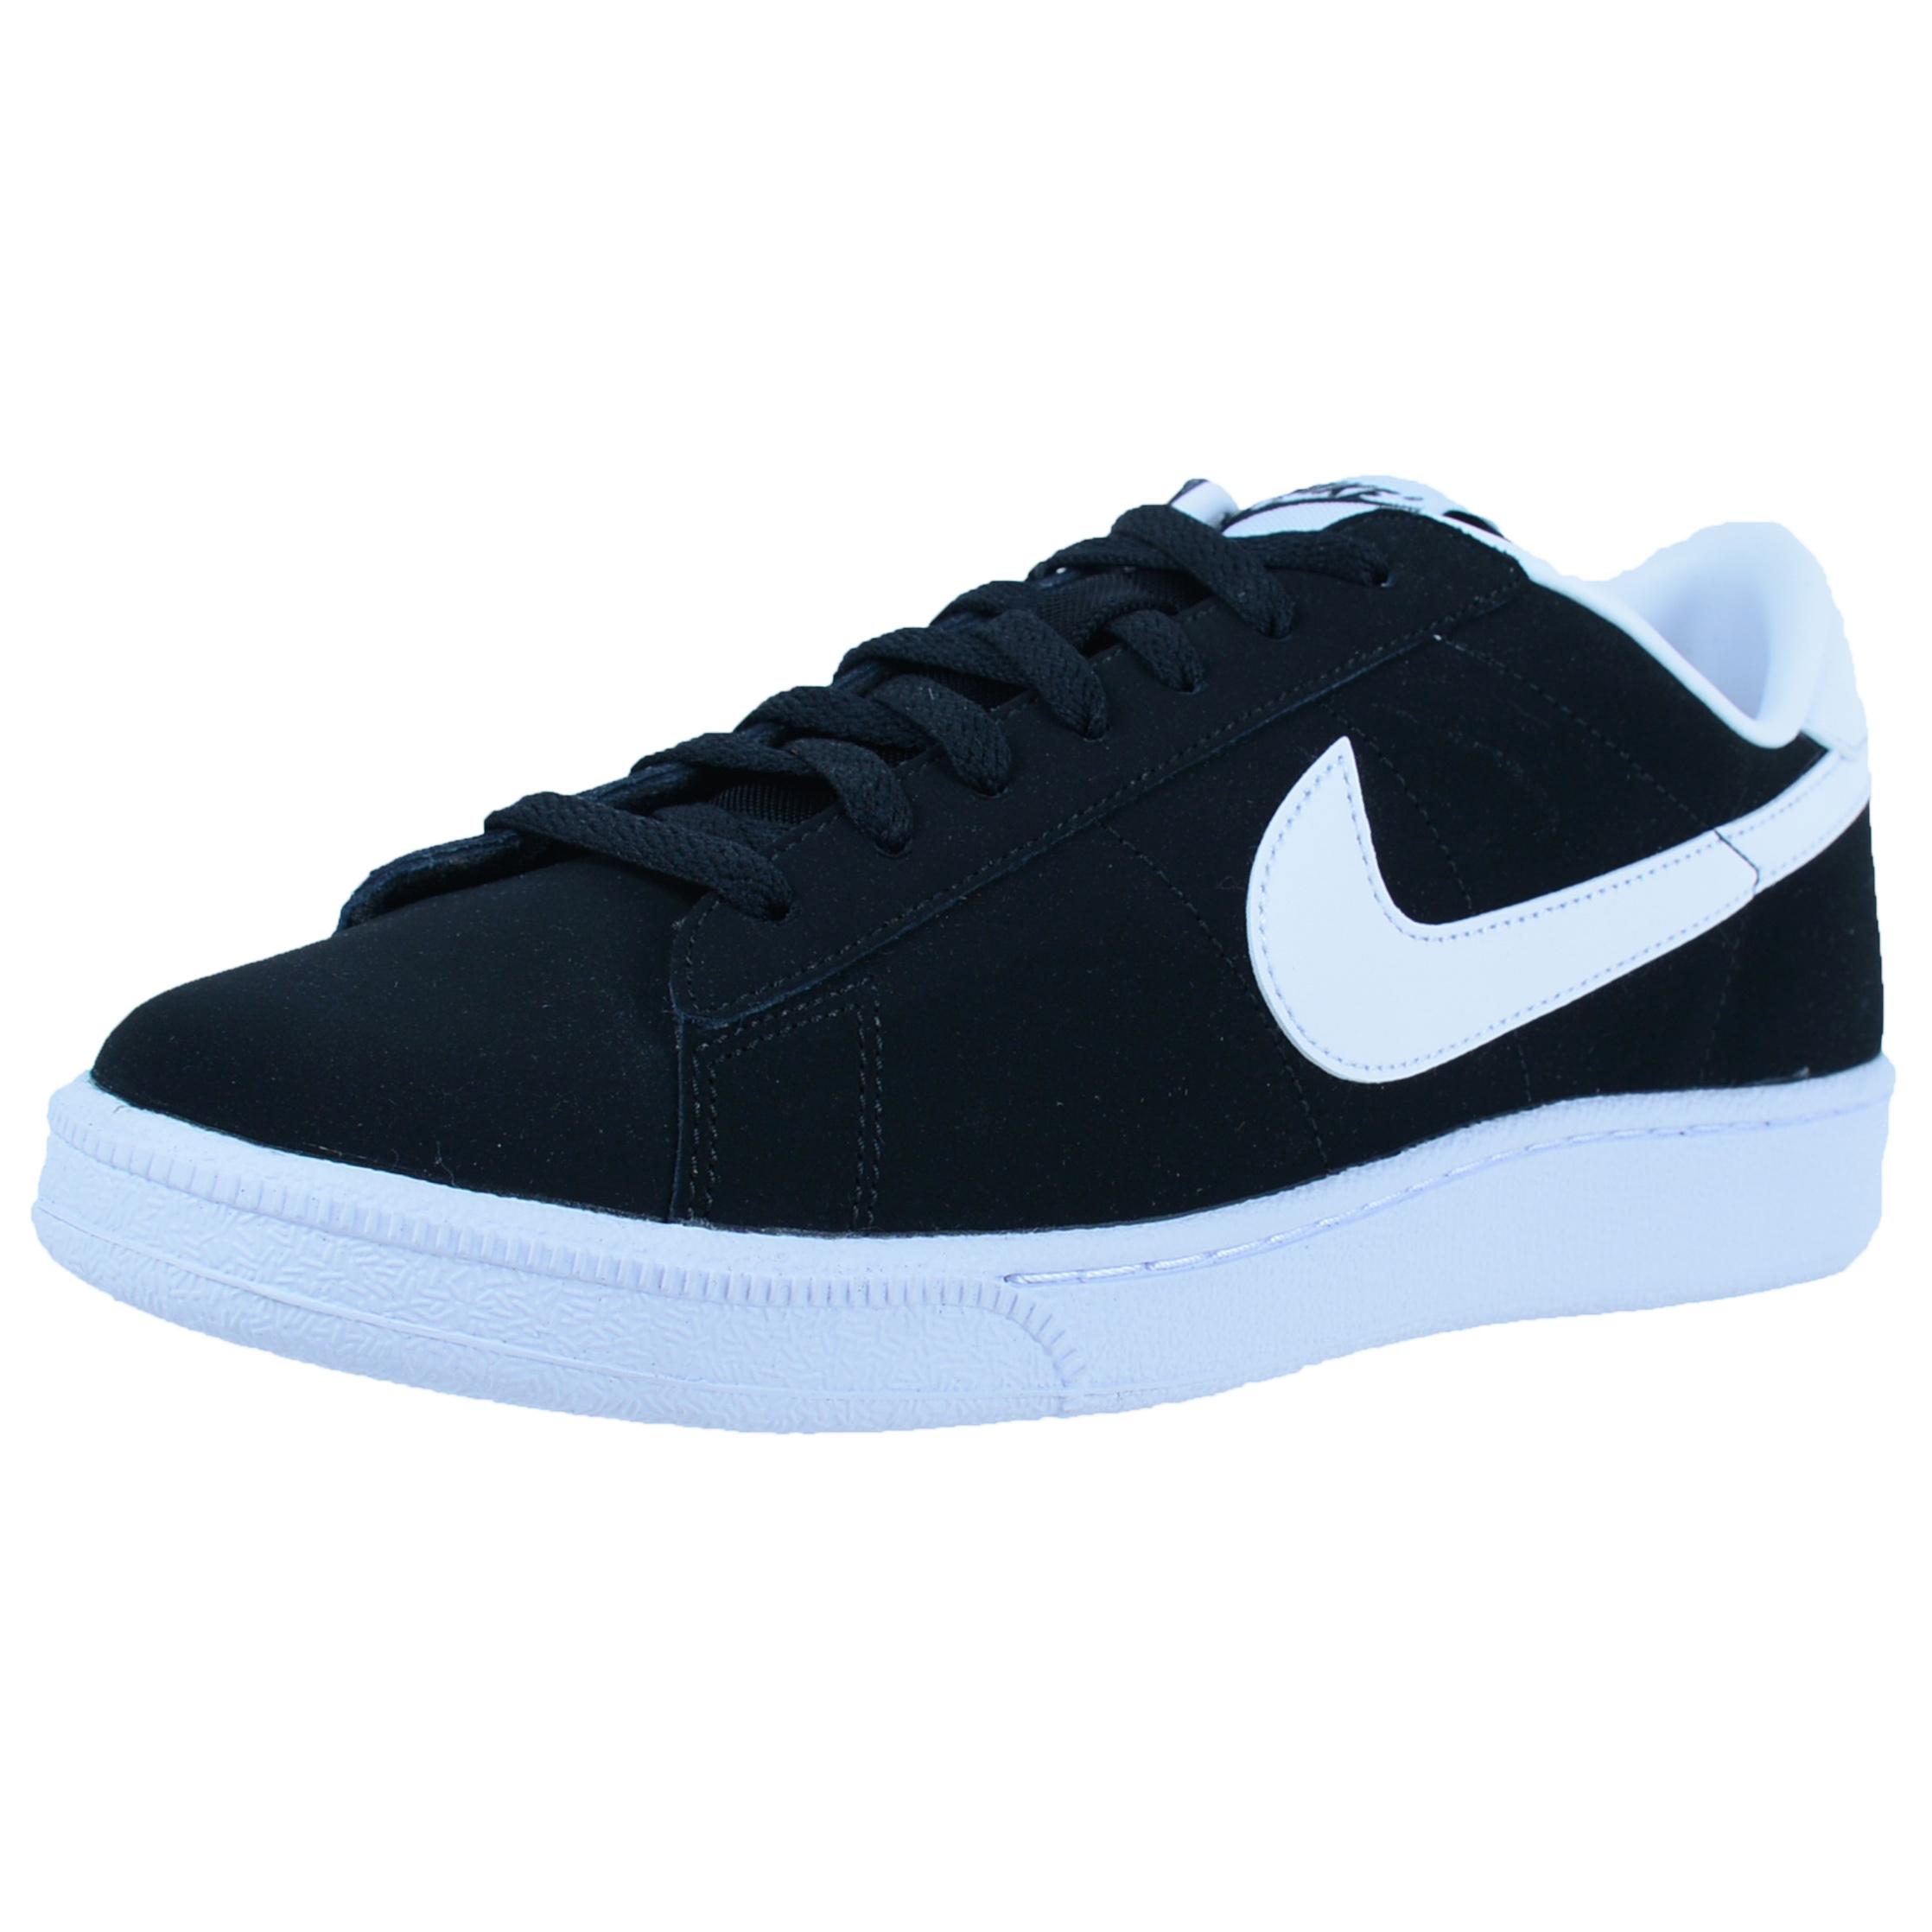 Nike Brs Shoes Black